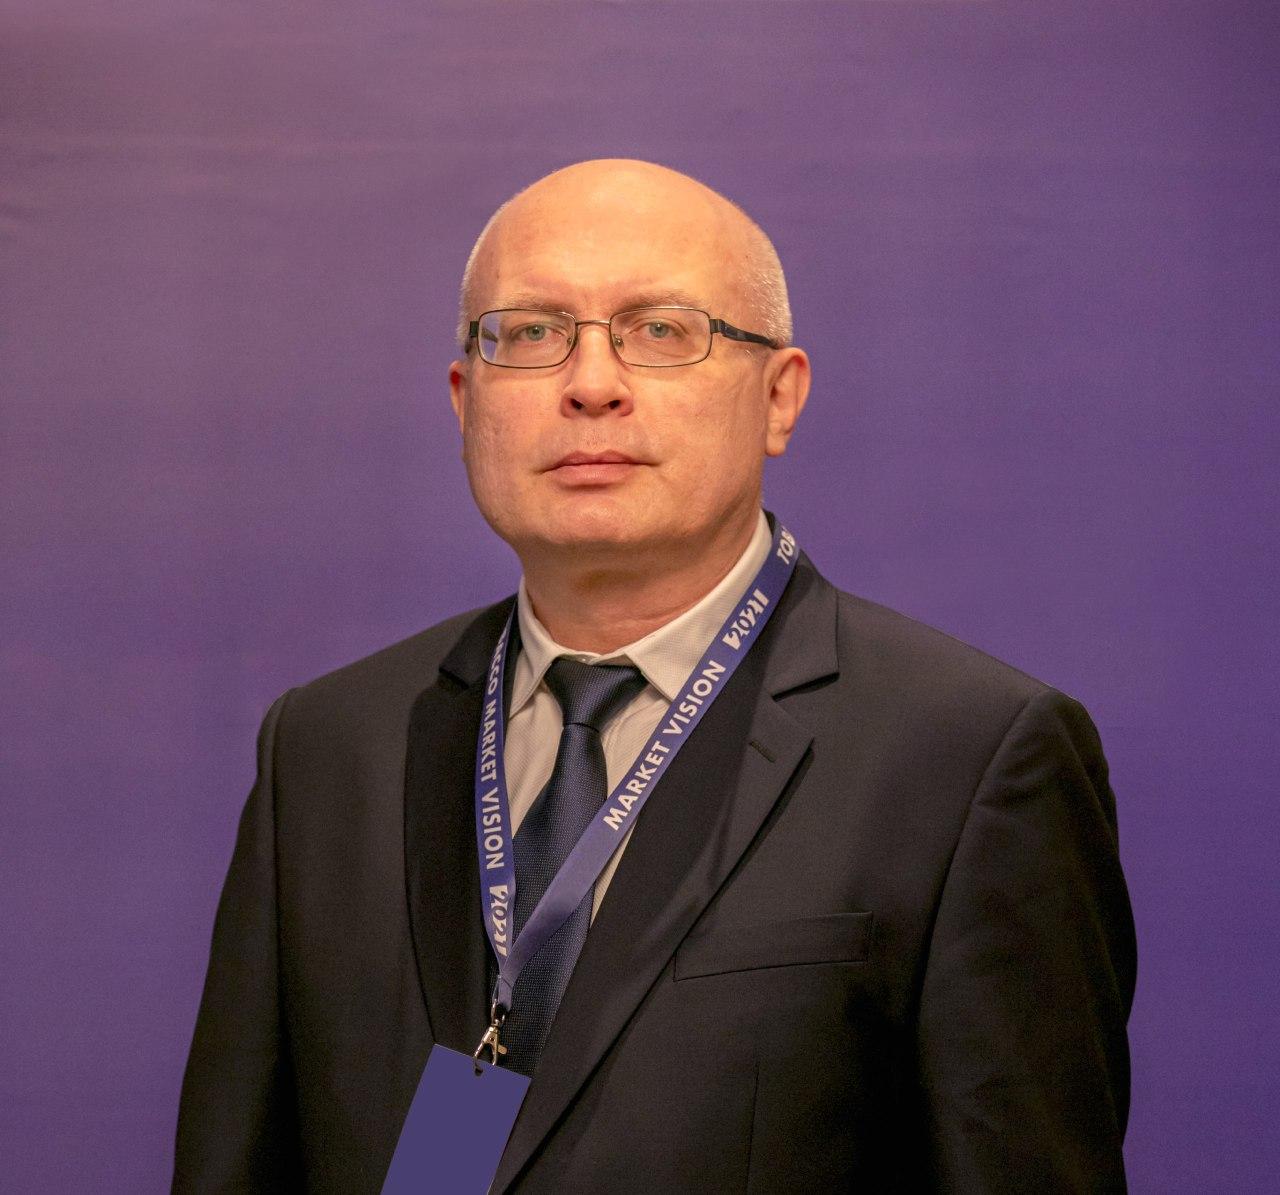 Сергей Кисляков назначен директором по маркетингу и развитию бизнеса Digma Business Group